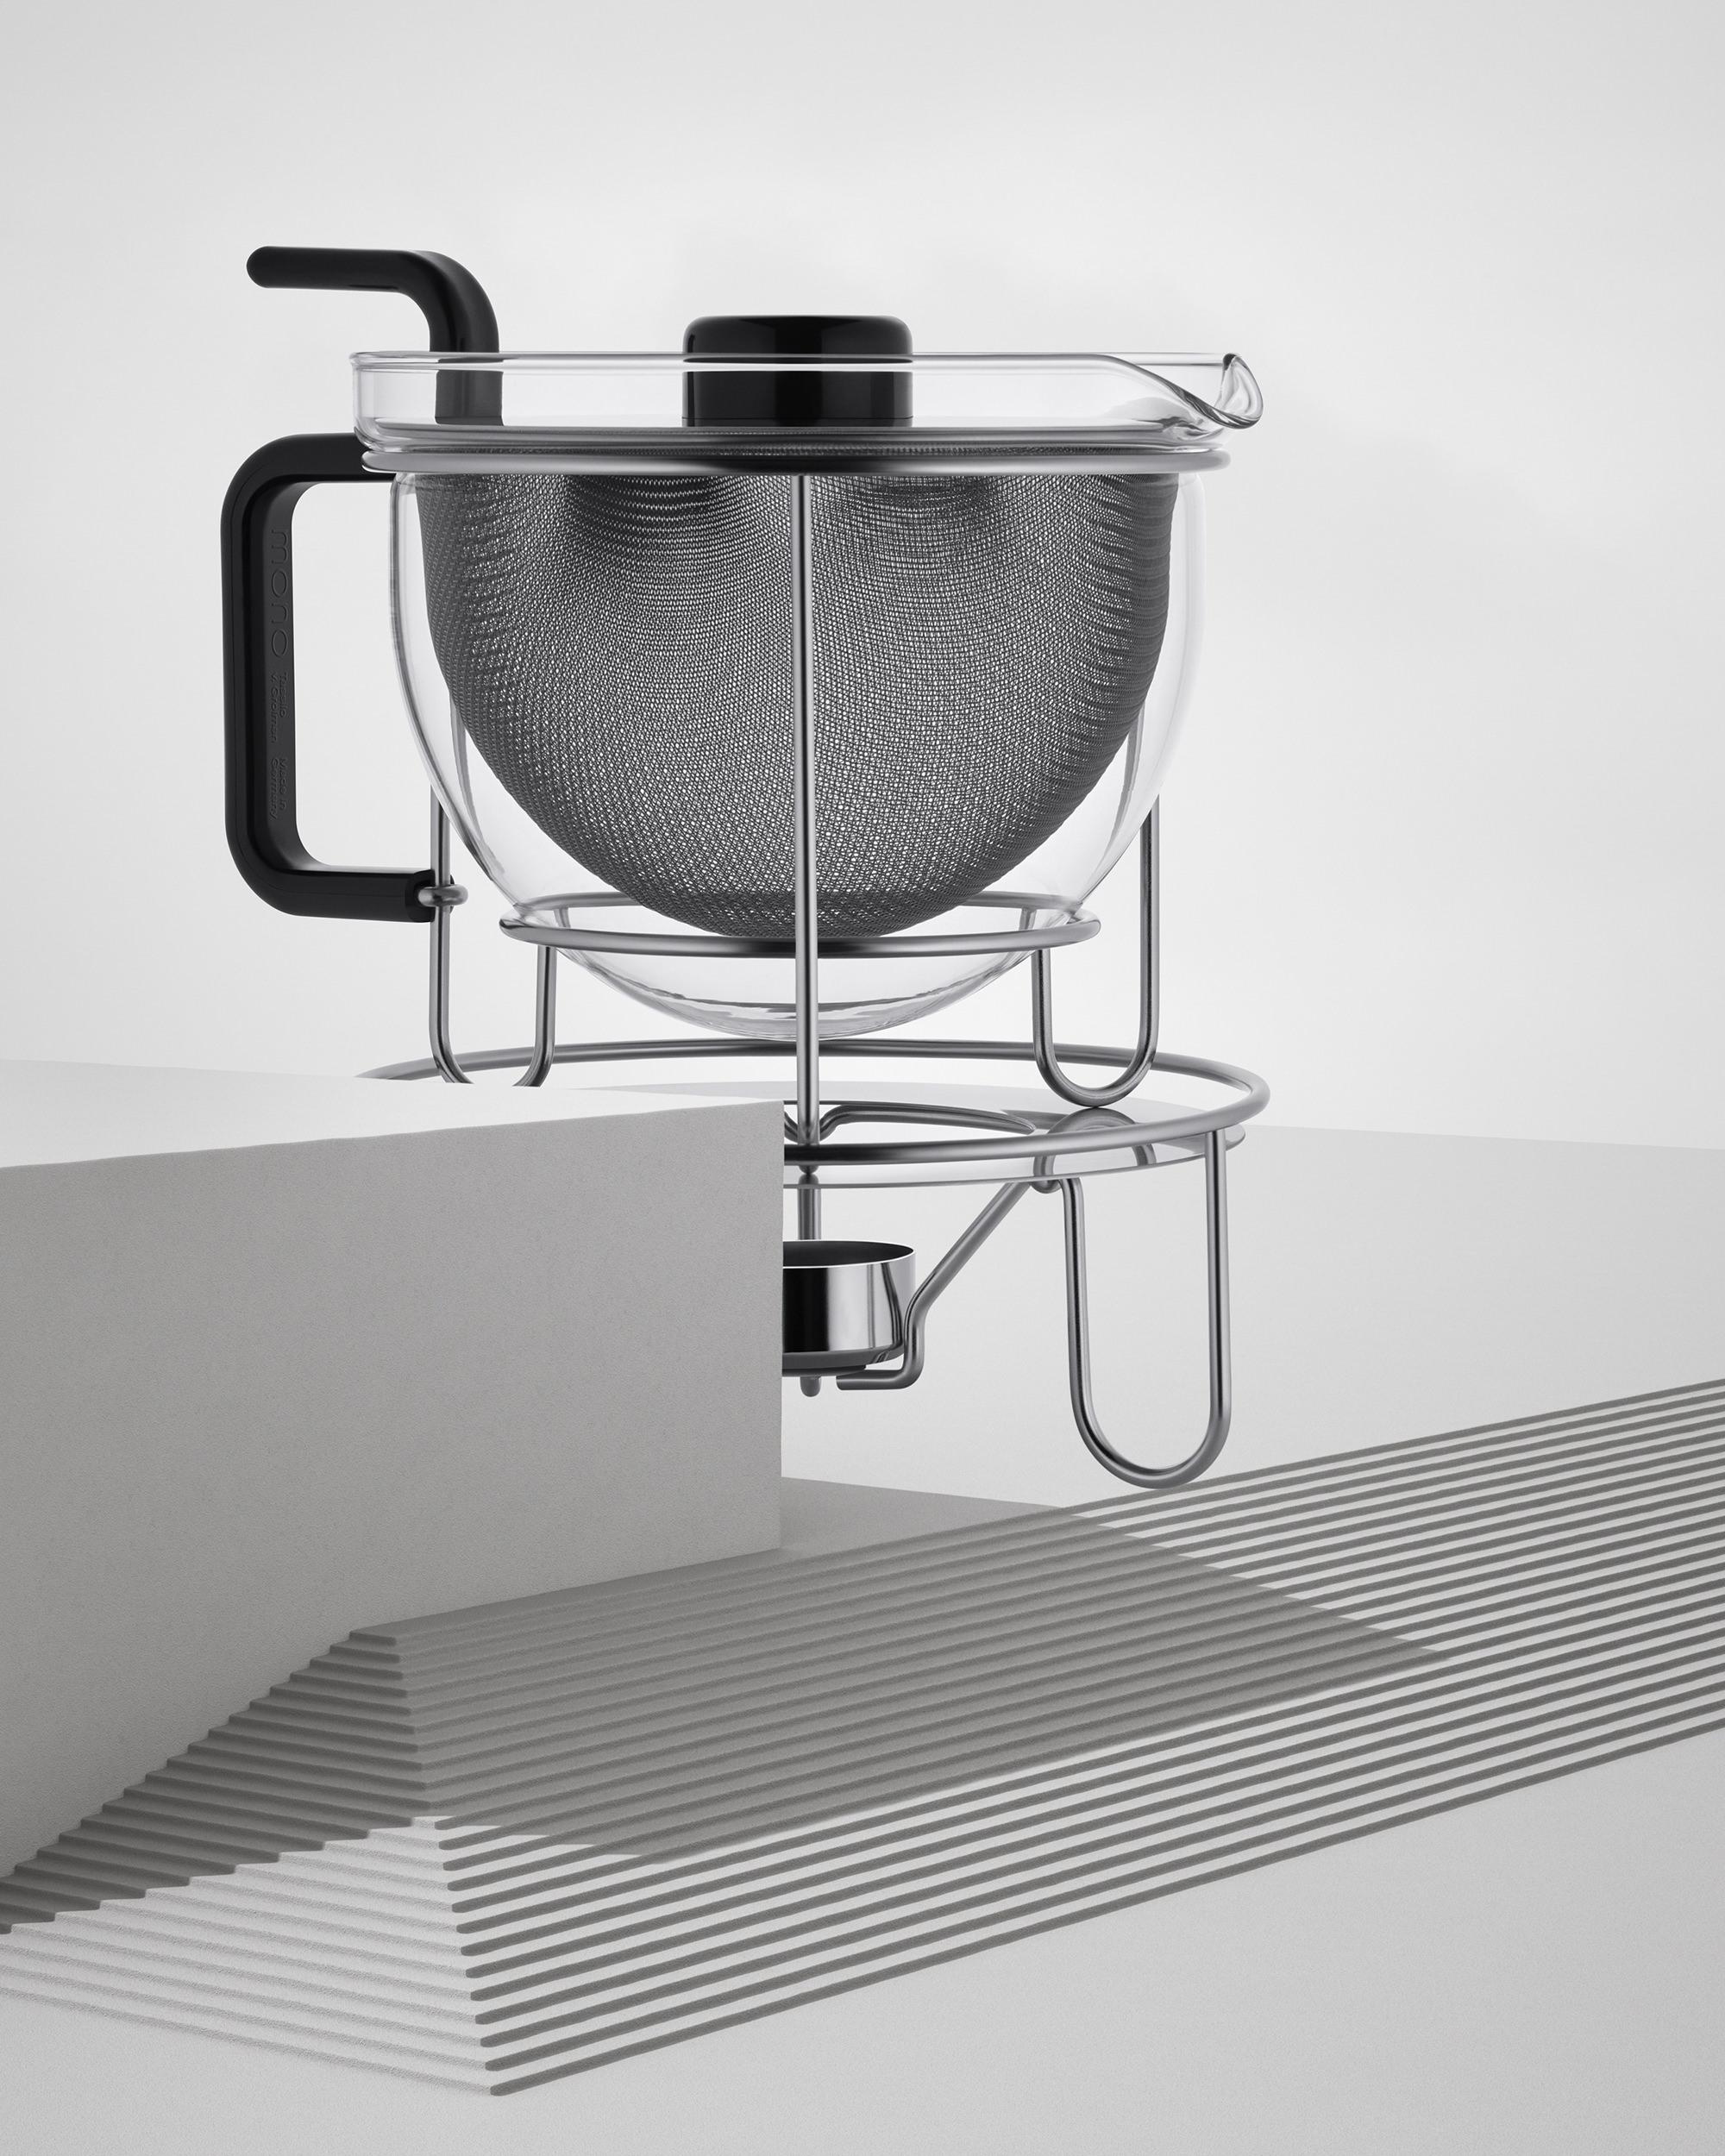 Mono Classic Teekanne Teapot Credits Hawlin Services 03